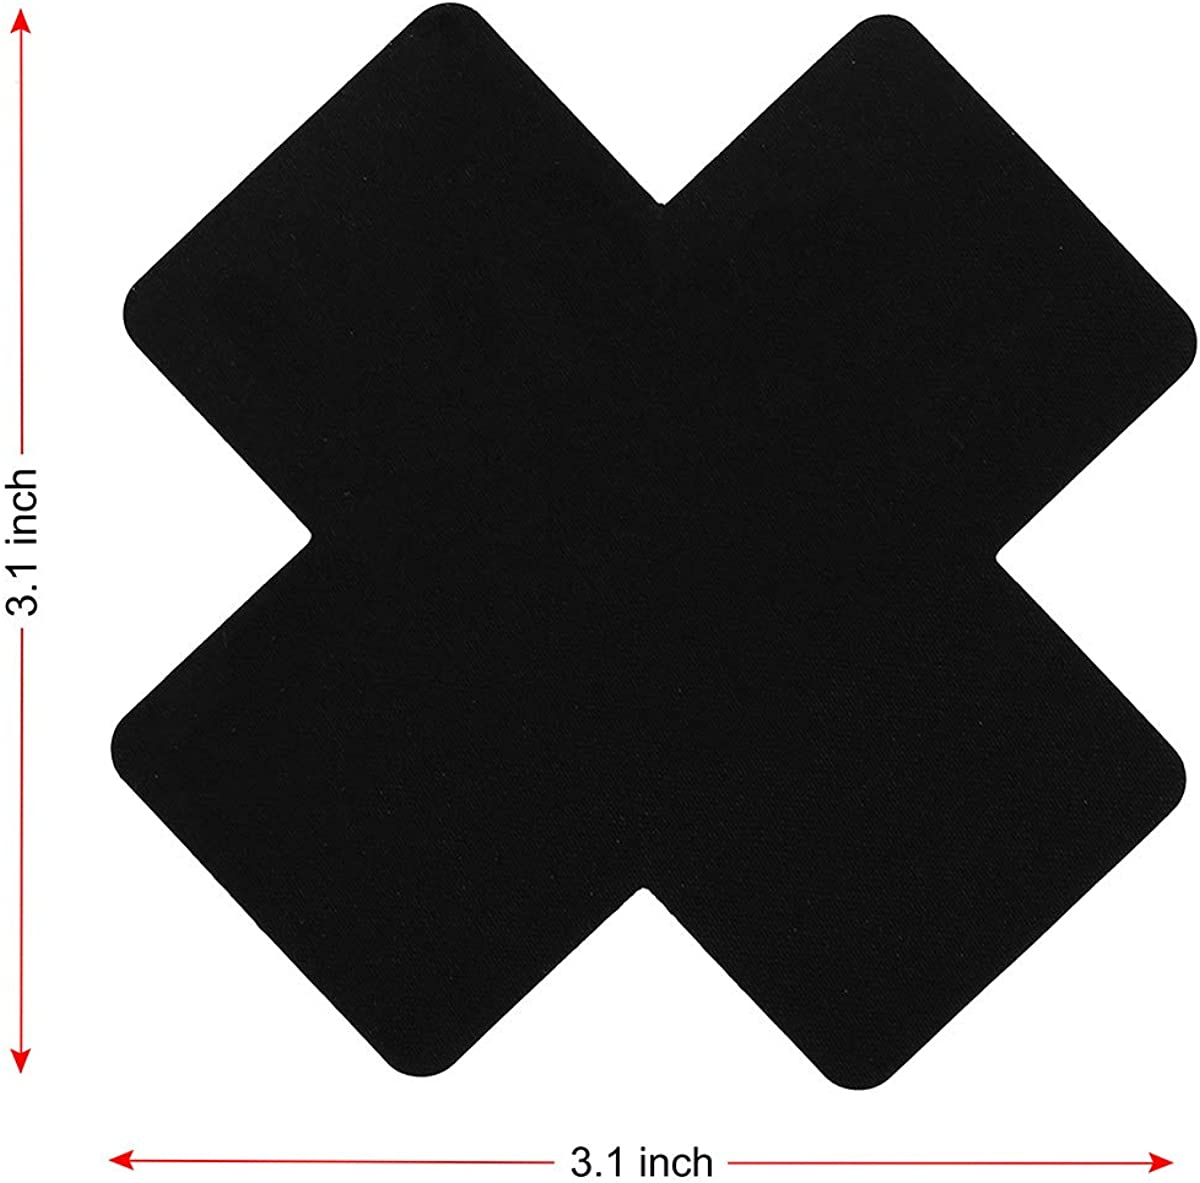 US 20Pcs Cross Shape Self-Adhesive Satin Nipple Cover Breast Pasties Stickers